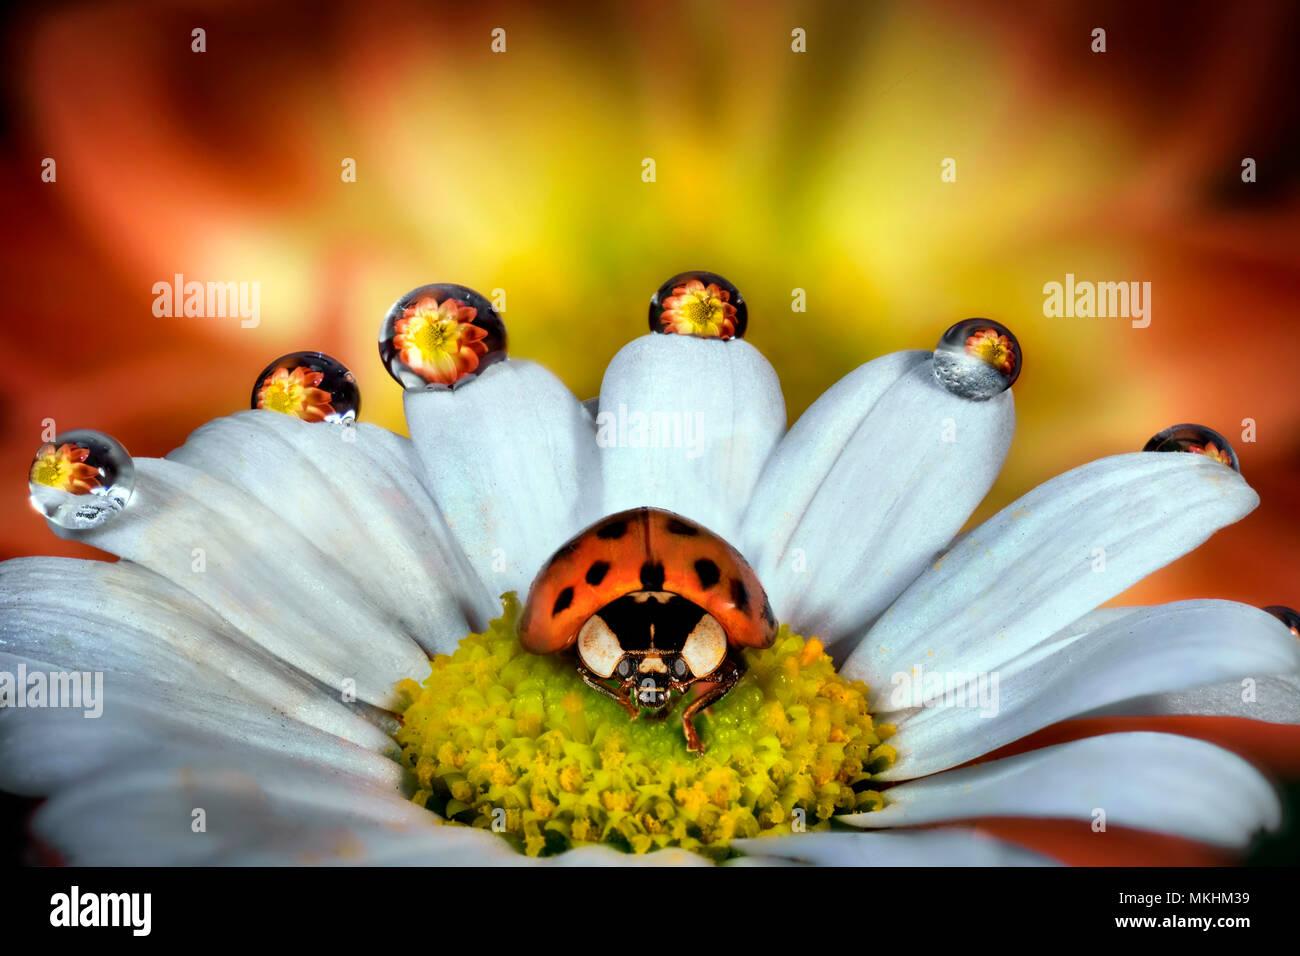 Marienkäfer auf einem Daisy, Parma, Italien Stockbild